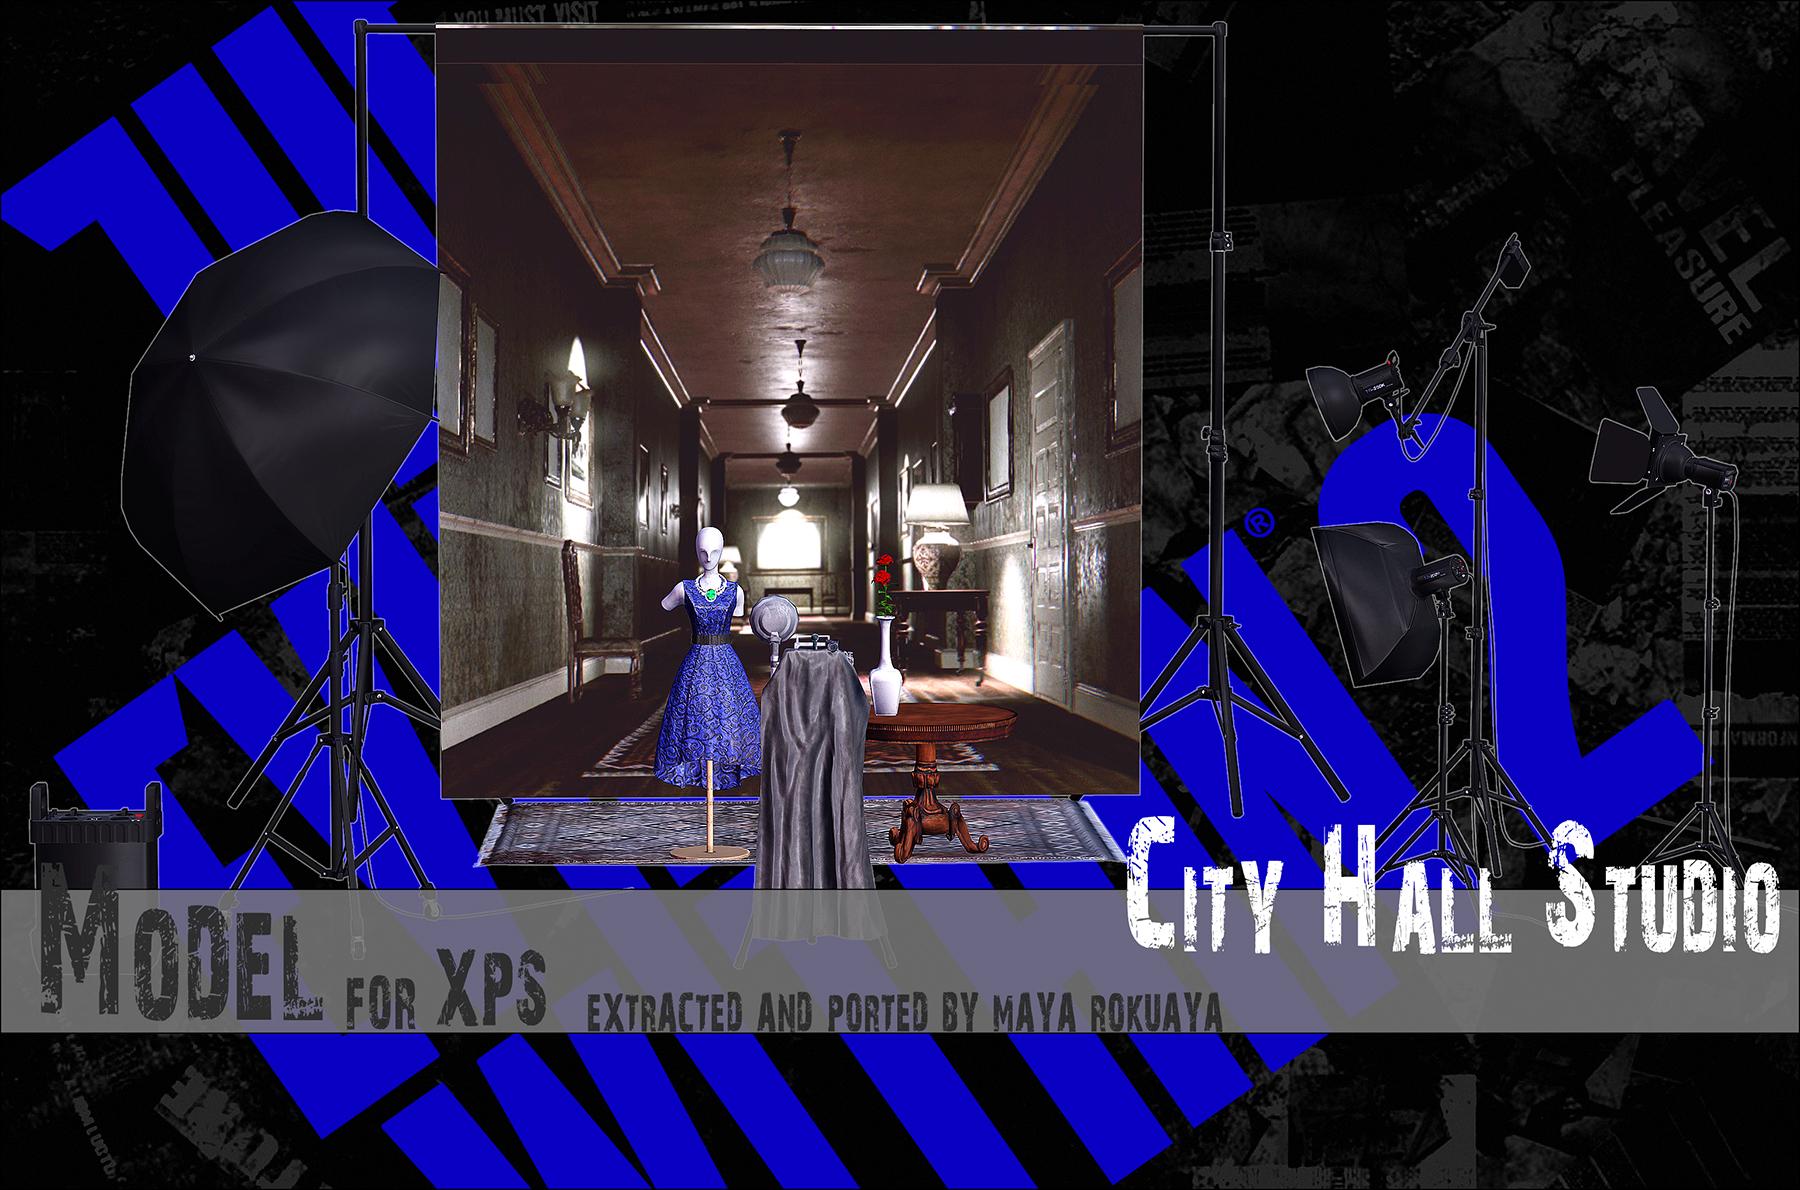 City Hall Studio By MayaRokuaya On DeviantArt